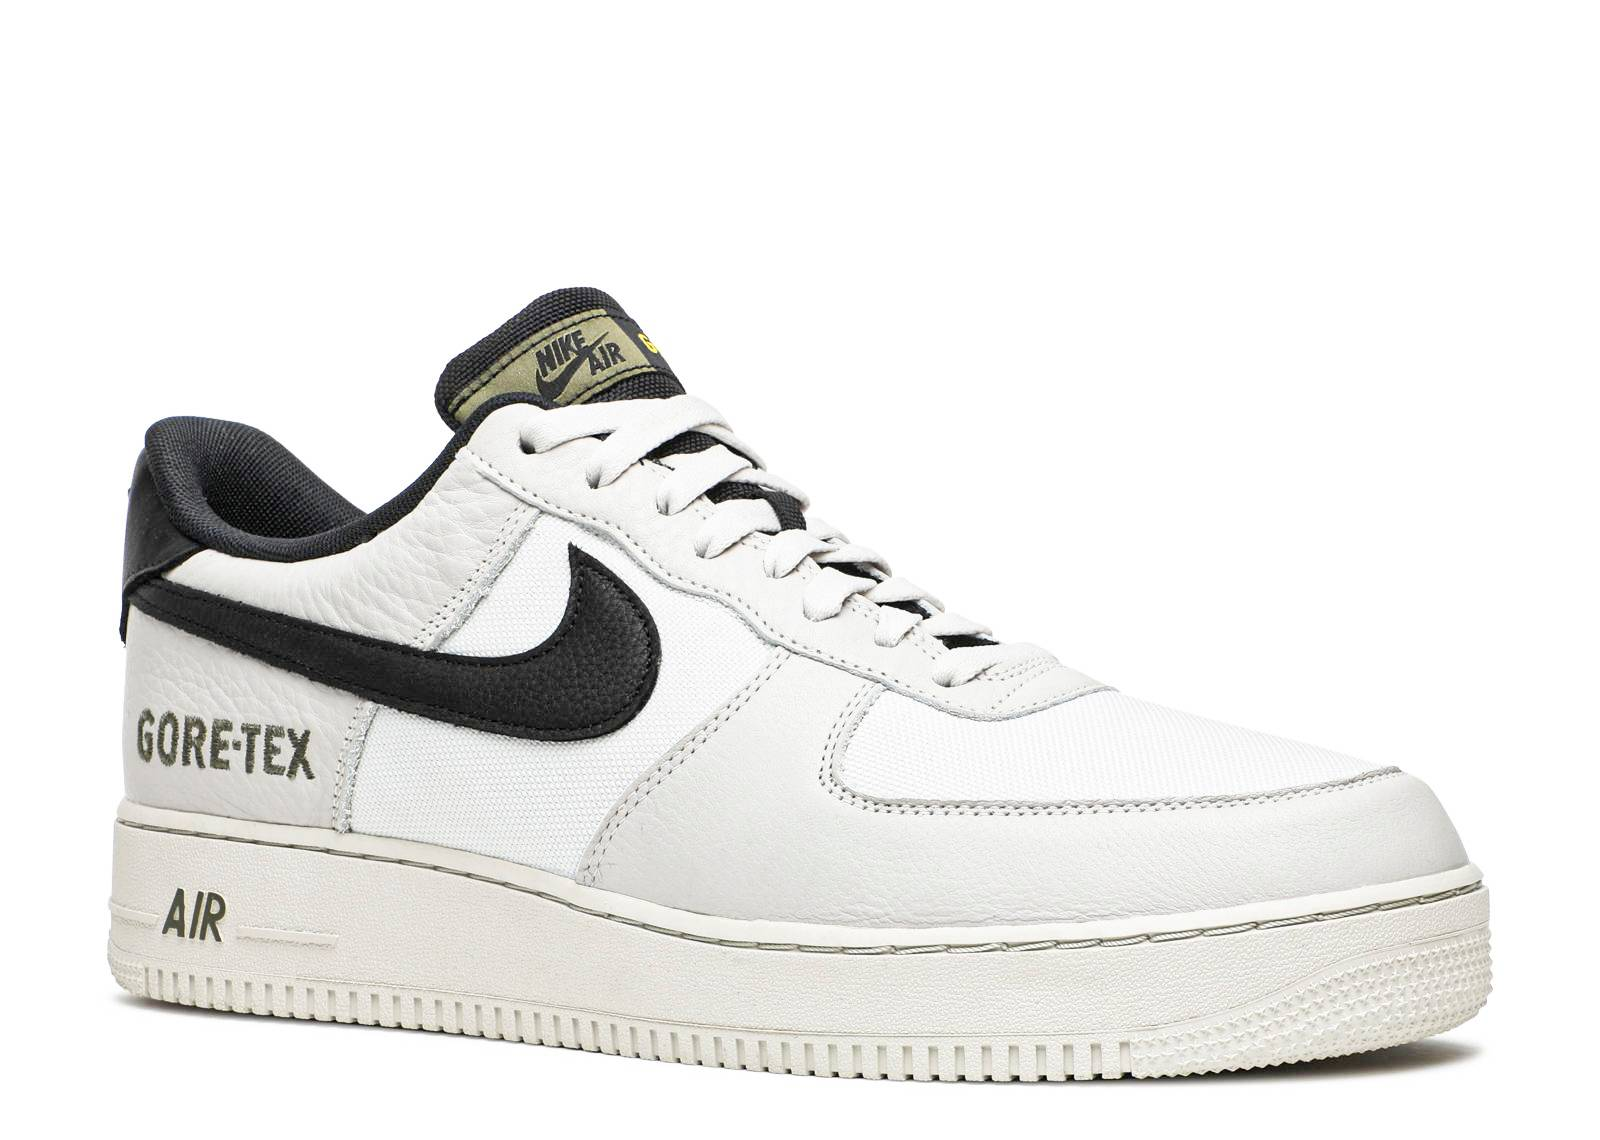 Gore-Tex x Air Force 1 Low 'White'